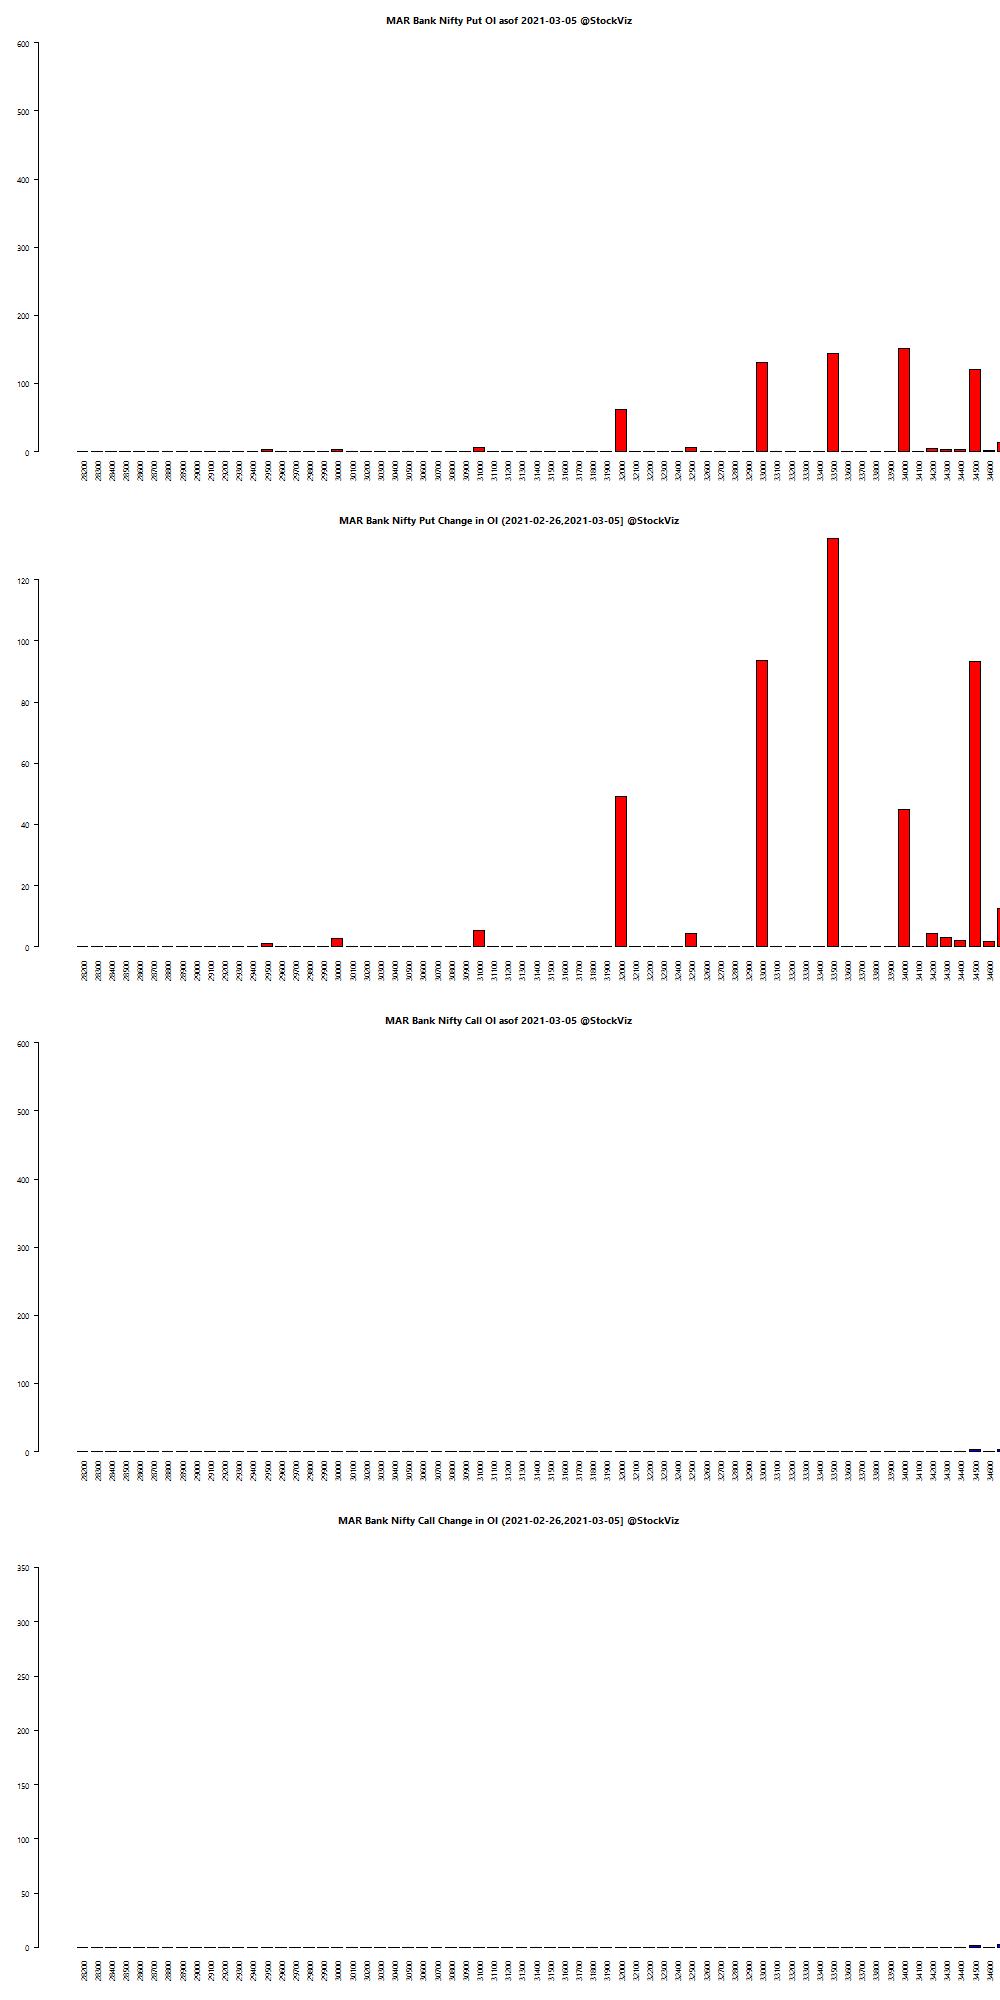 MAR BANKNIFTY OI chart